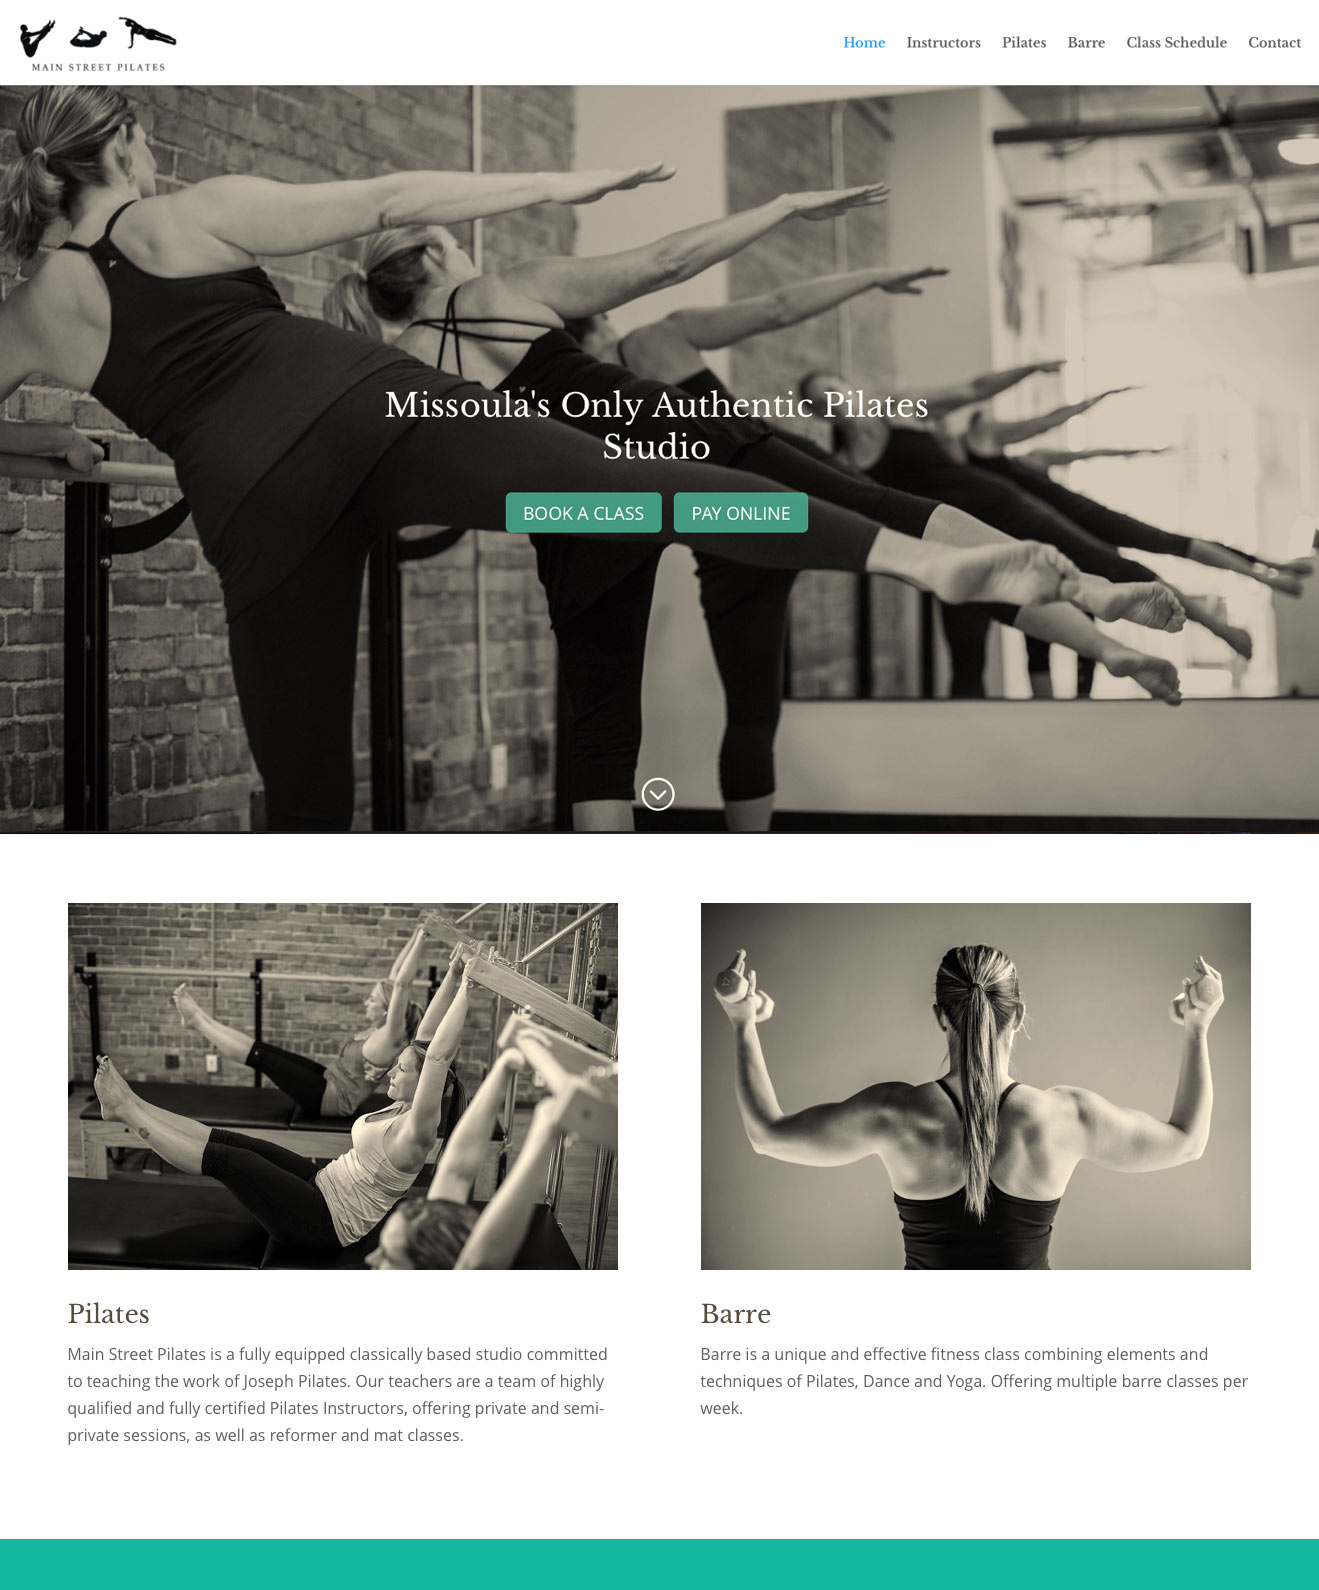 Main Street Pilates website